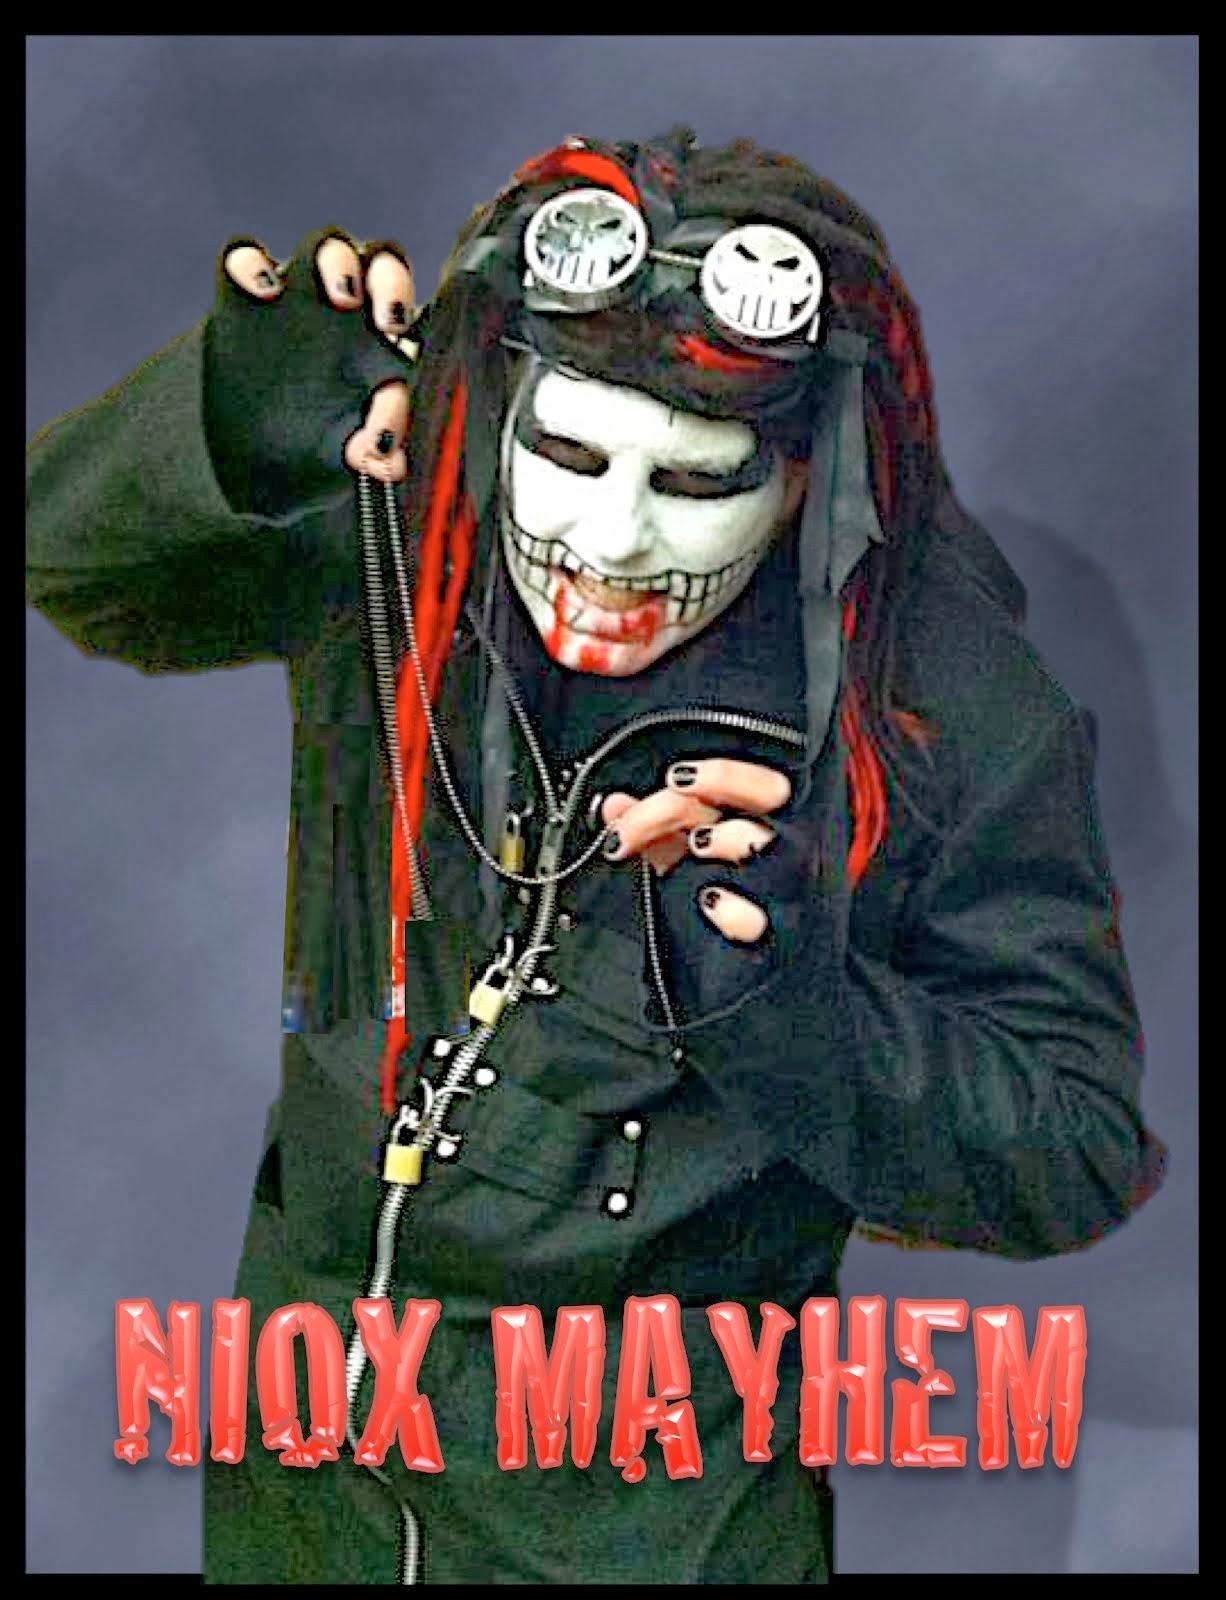 NIOX MAYHEM